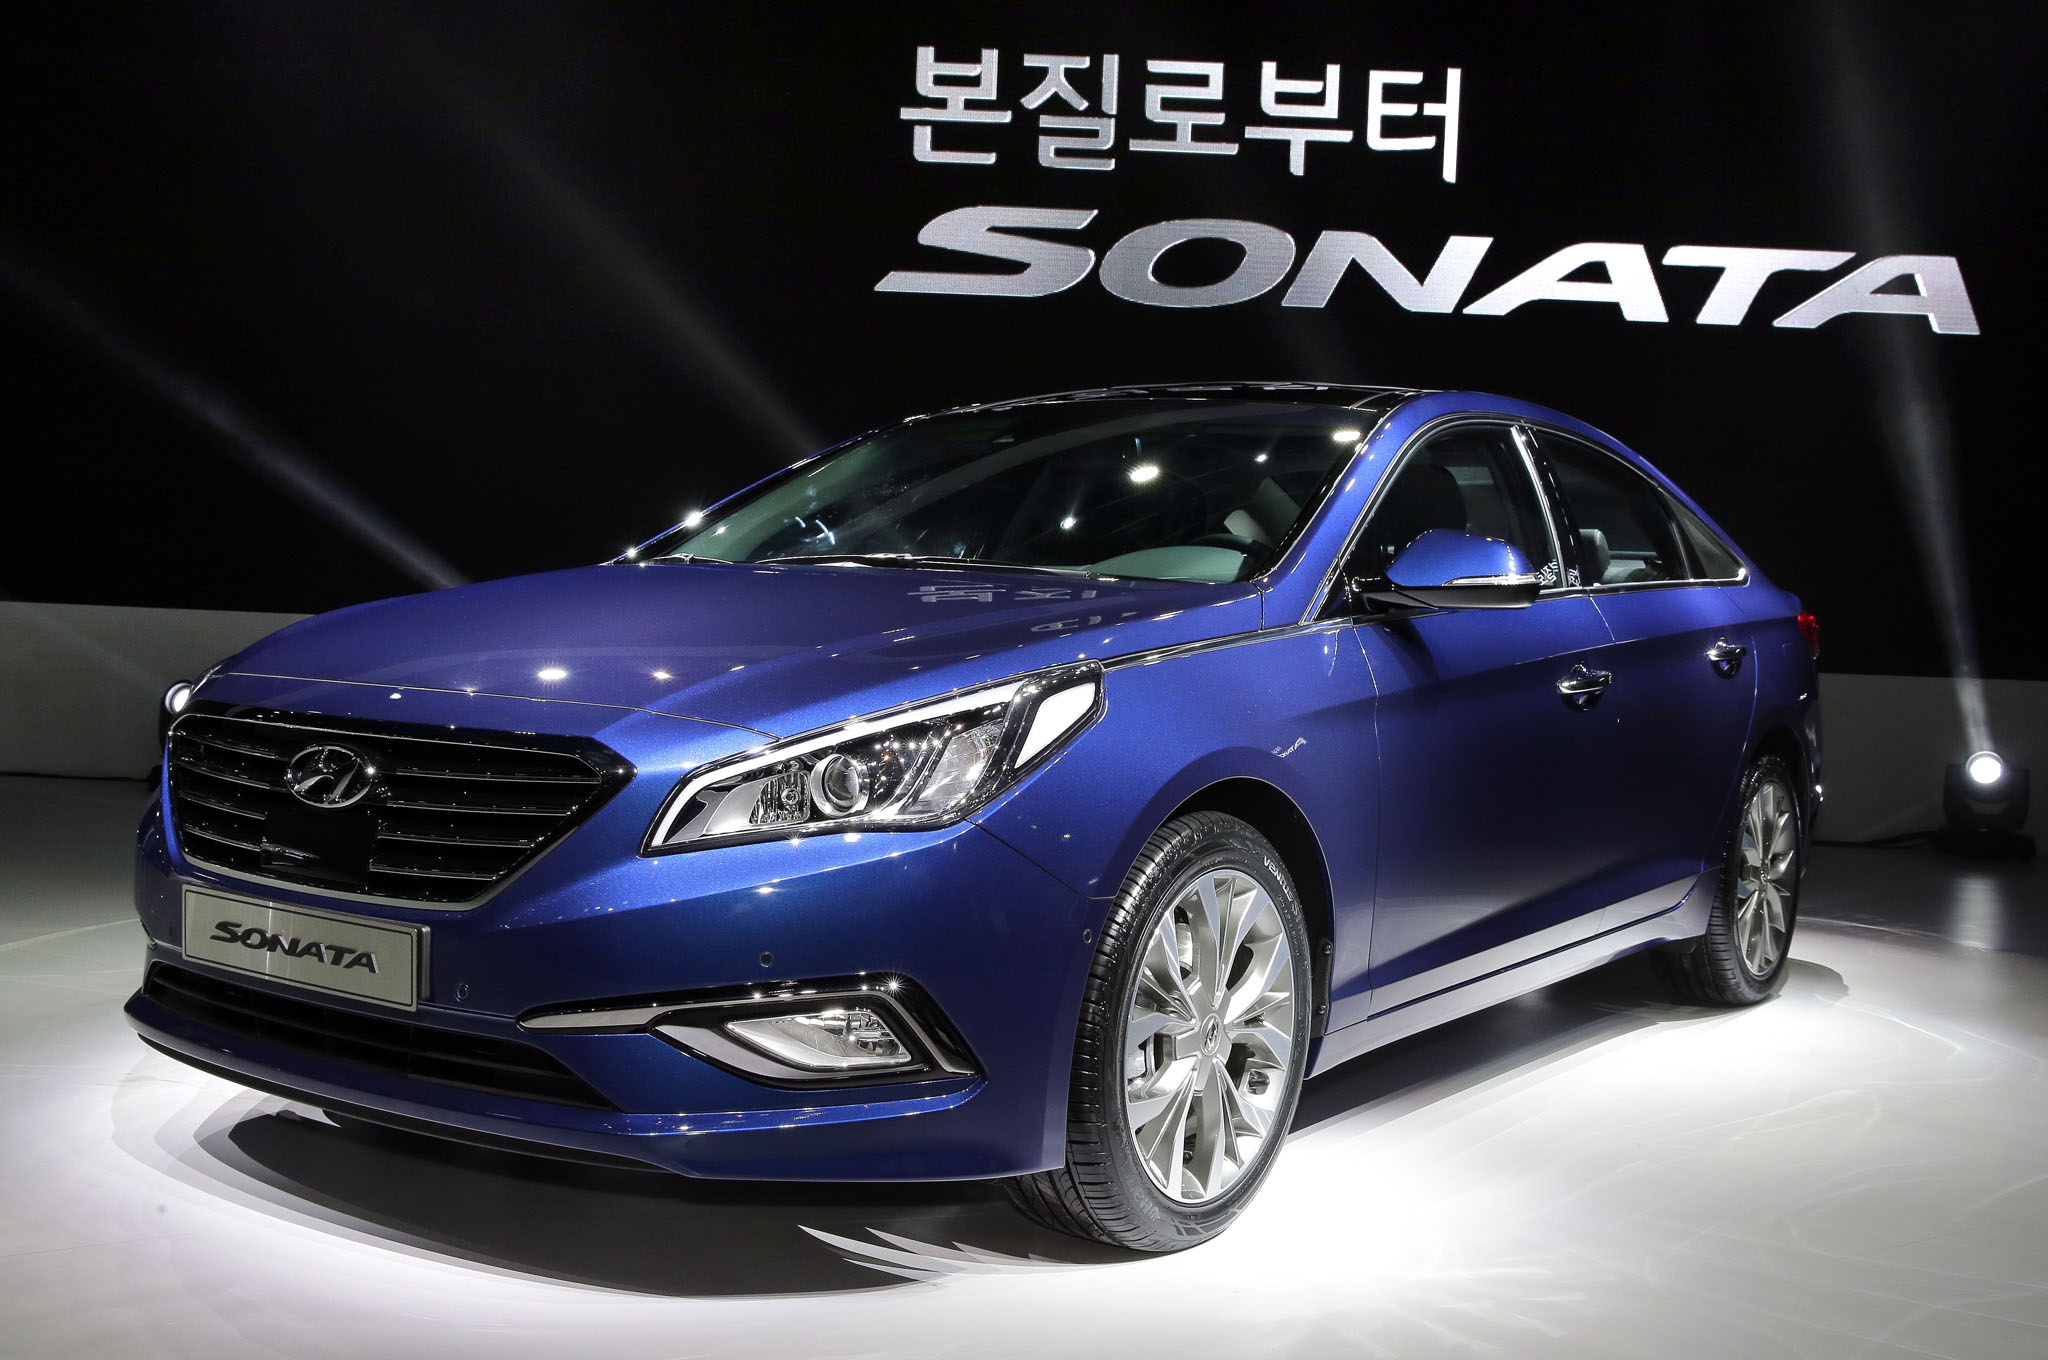 2015 Hyundai Sonata Front Reveal Korean Spec1